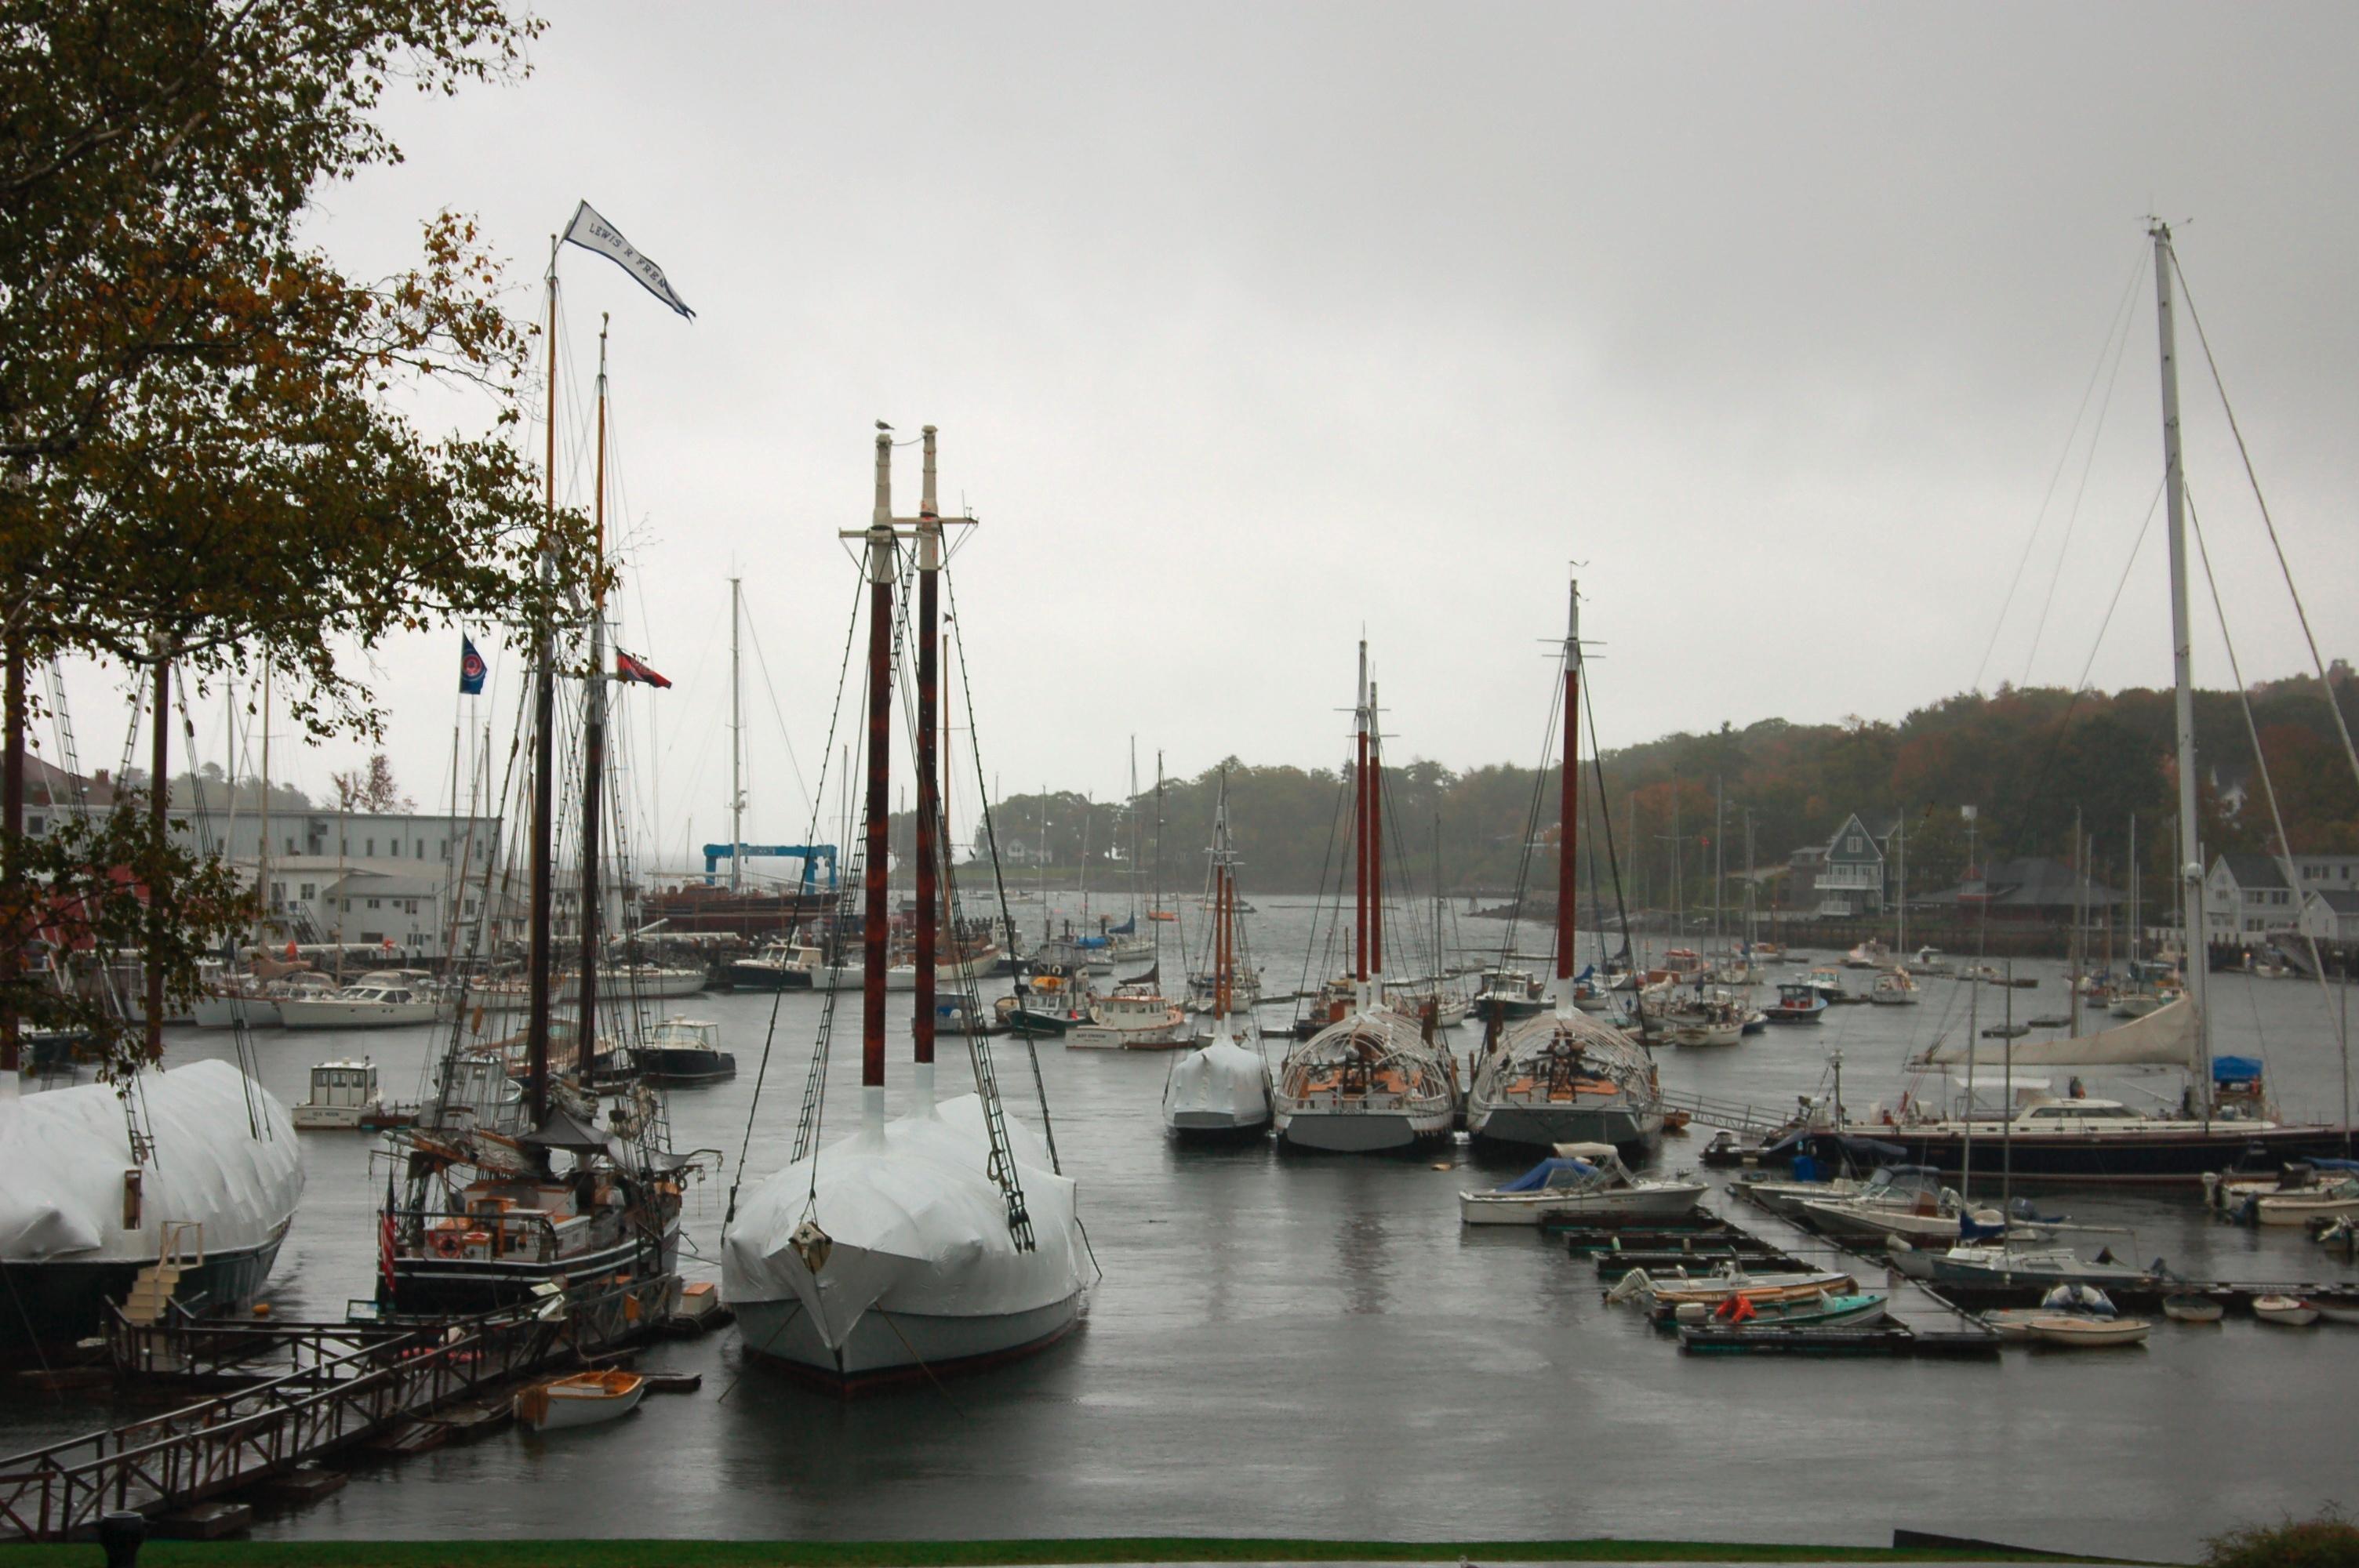 Boats in Winter Camden Maine